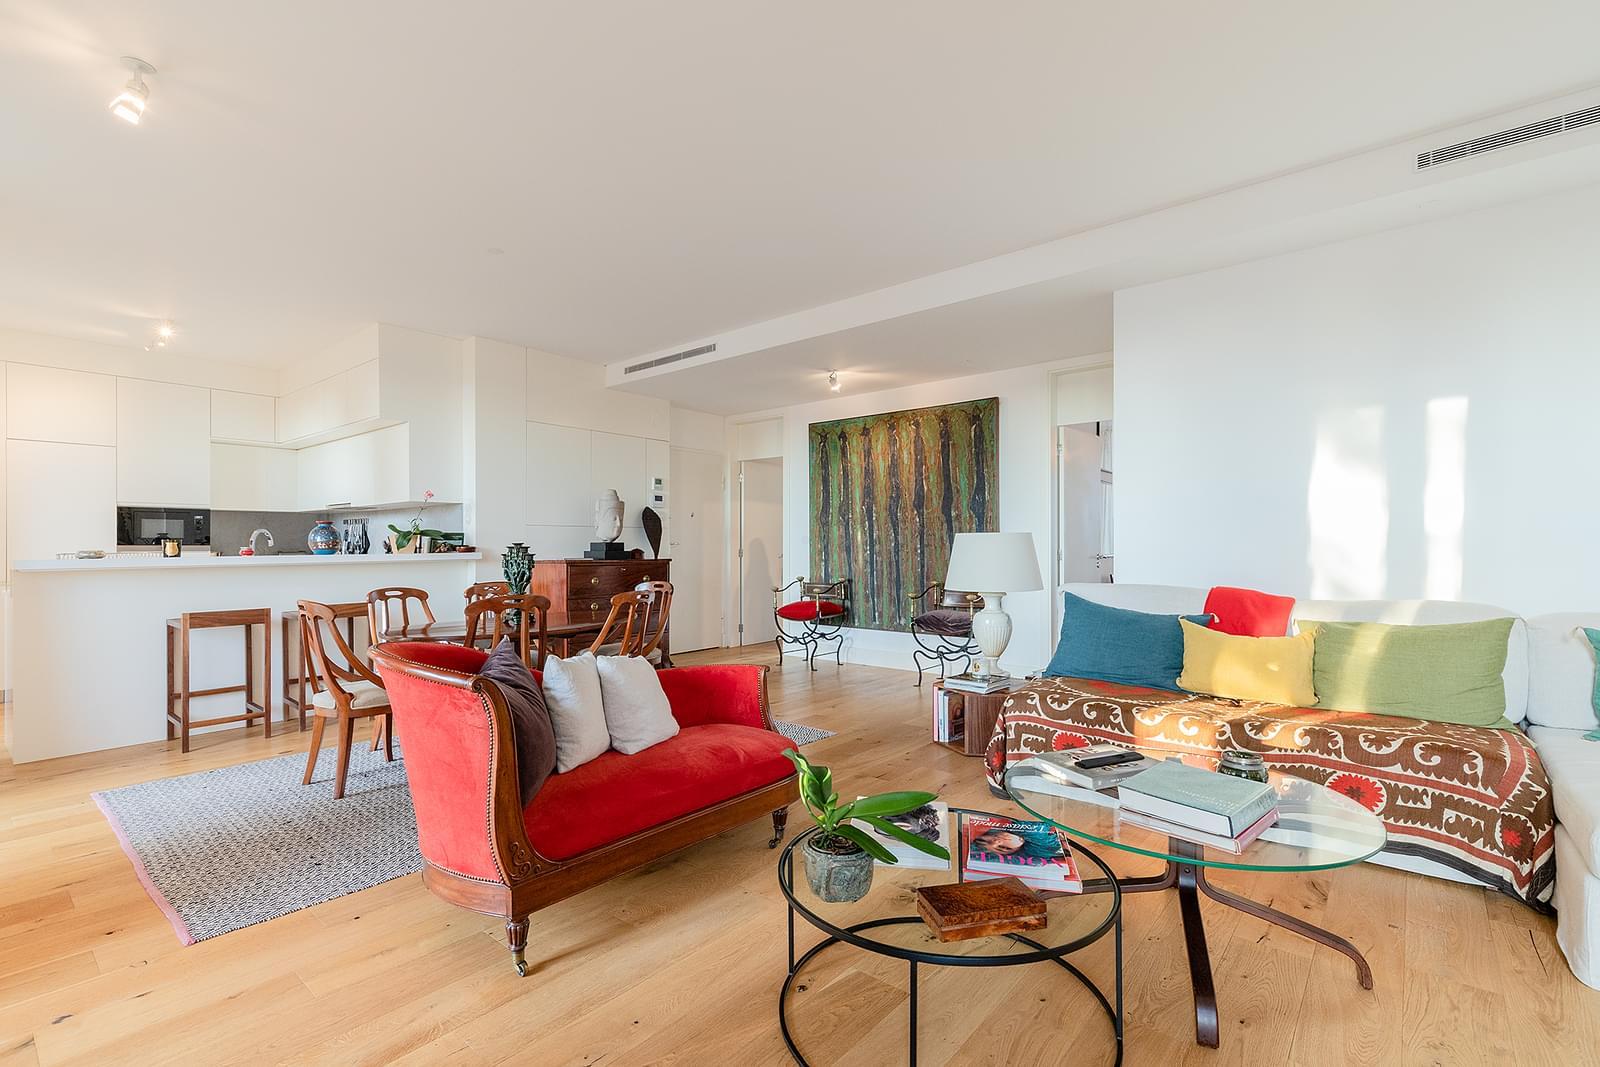 pf18824-apartamento-t2-1-lisboa-5ce1c1da-012a-4b71-b3f1-0a65187d0601